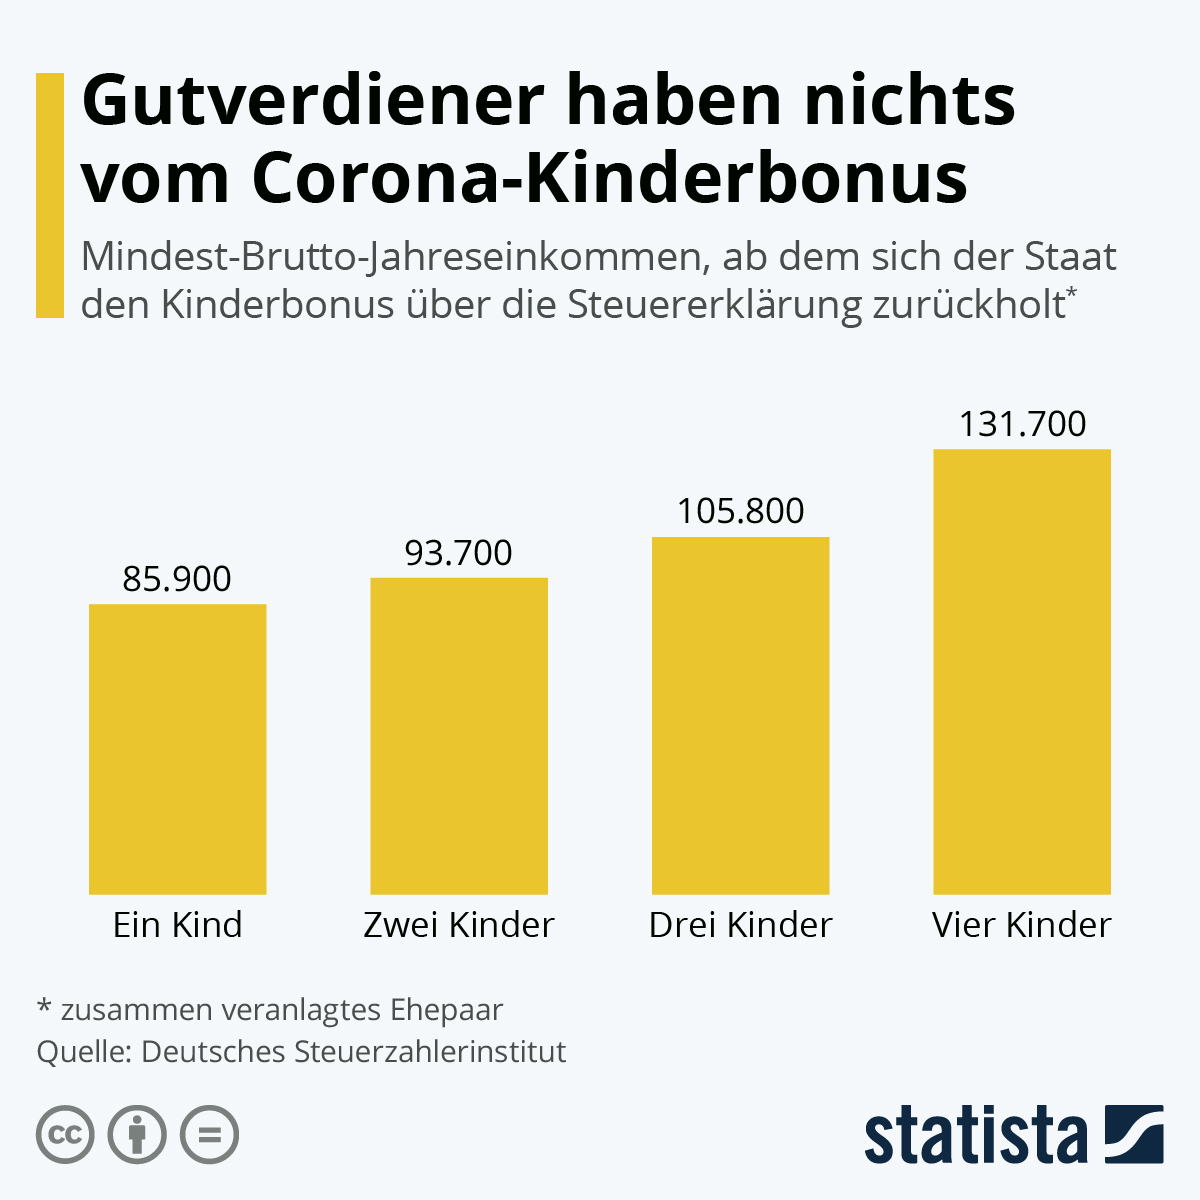 Infografik: Gutverdiener haben nichts vom Corona-Kinderbonus | Statista